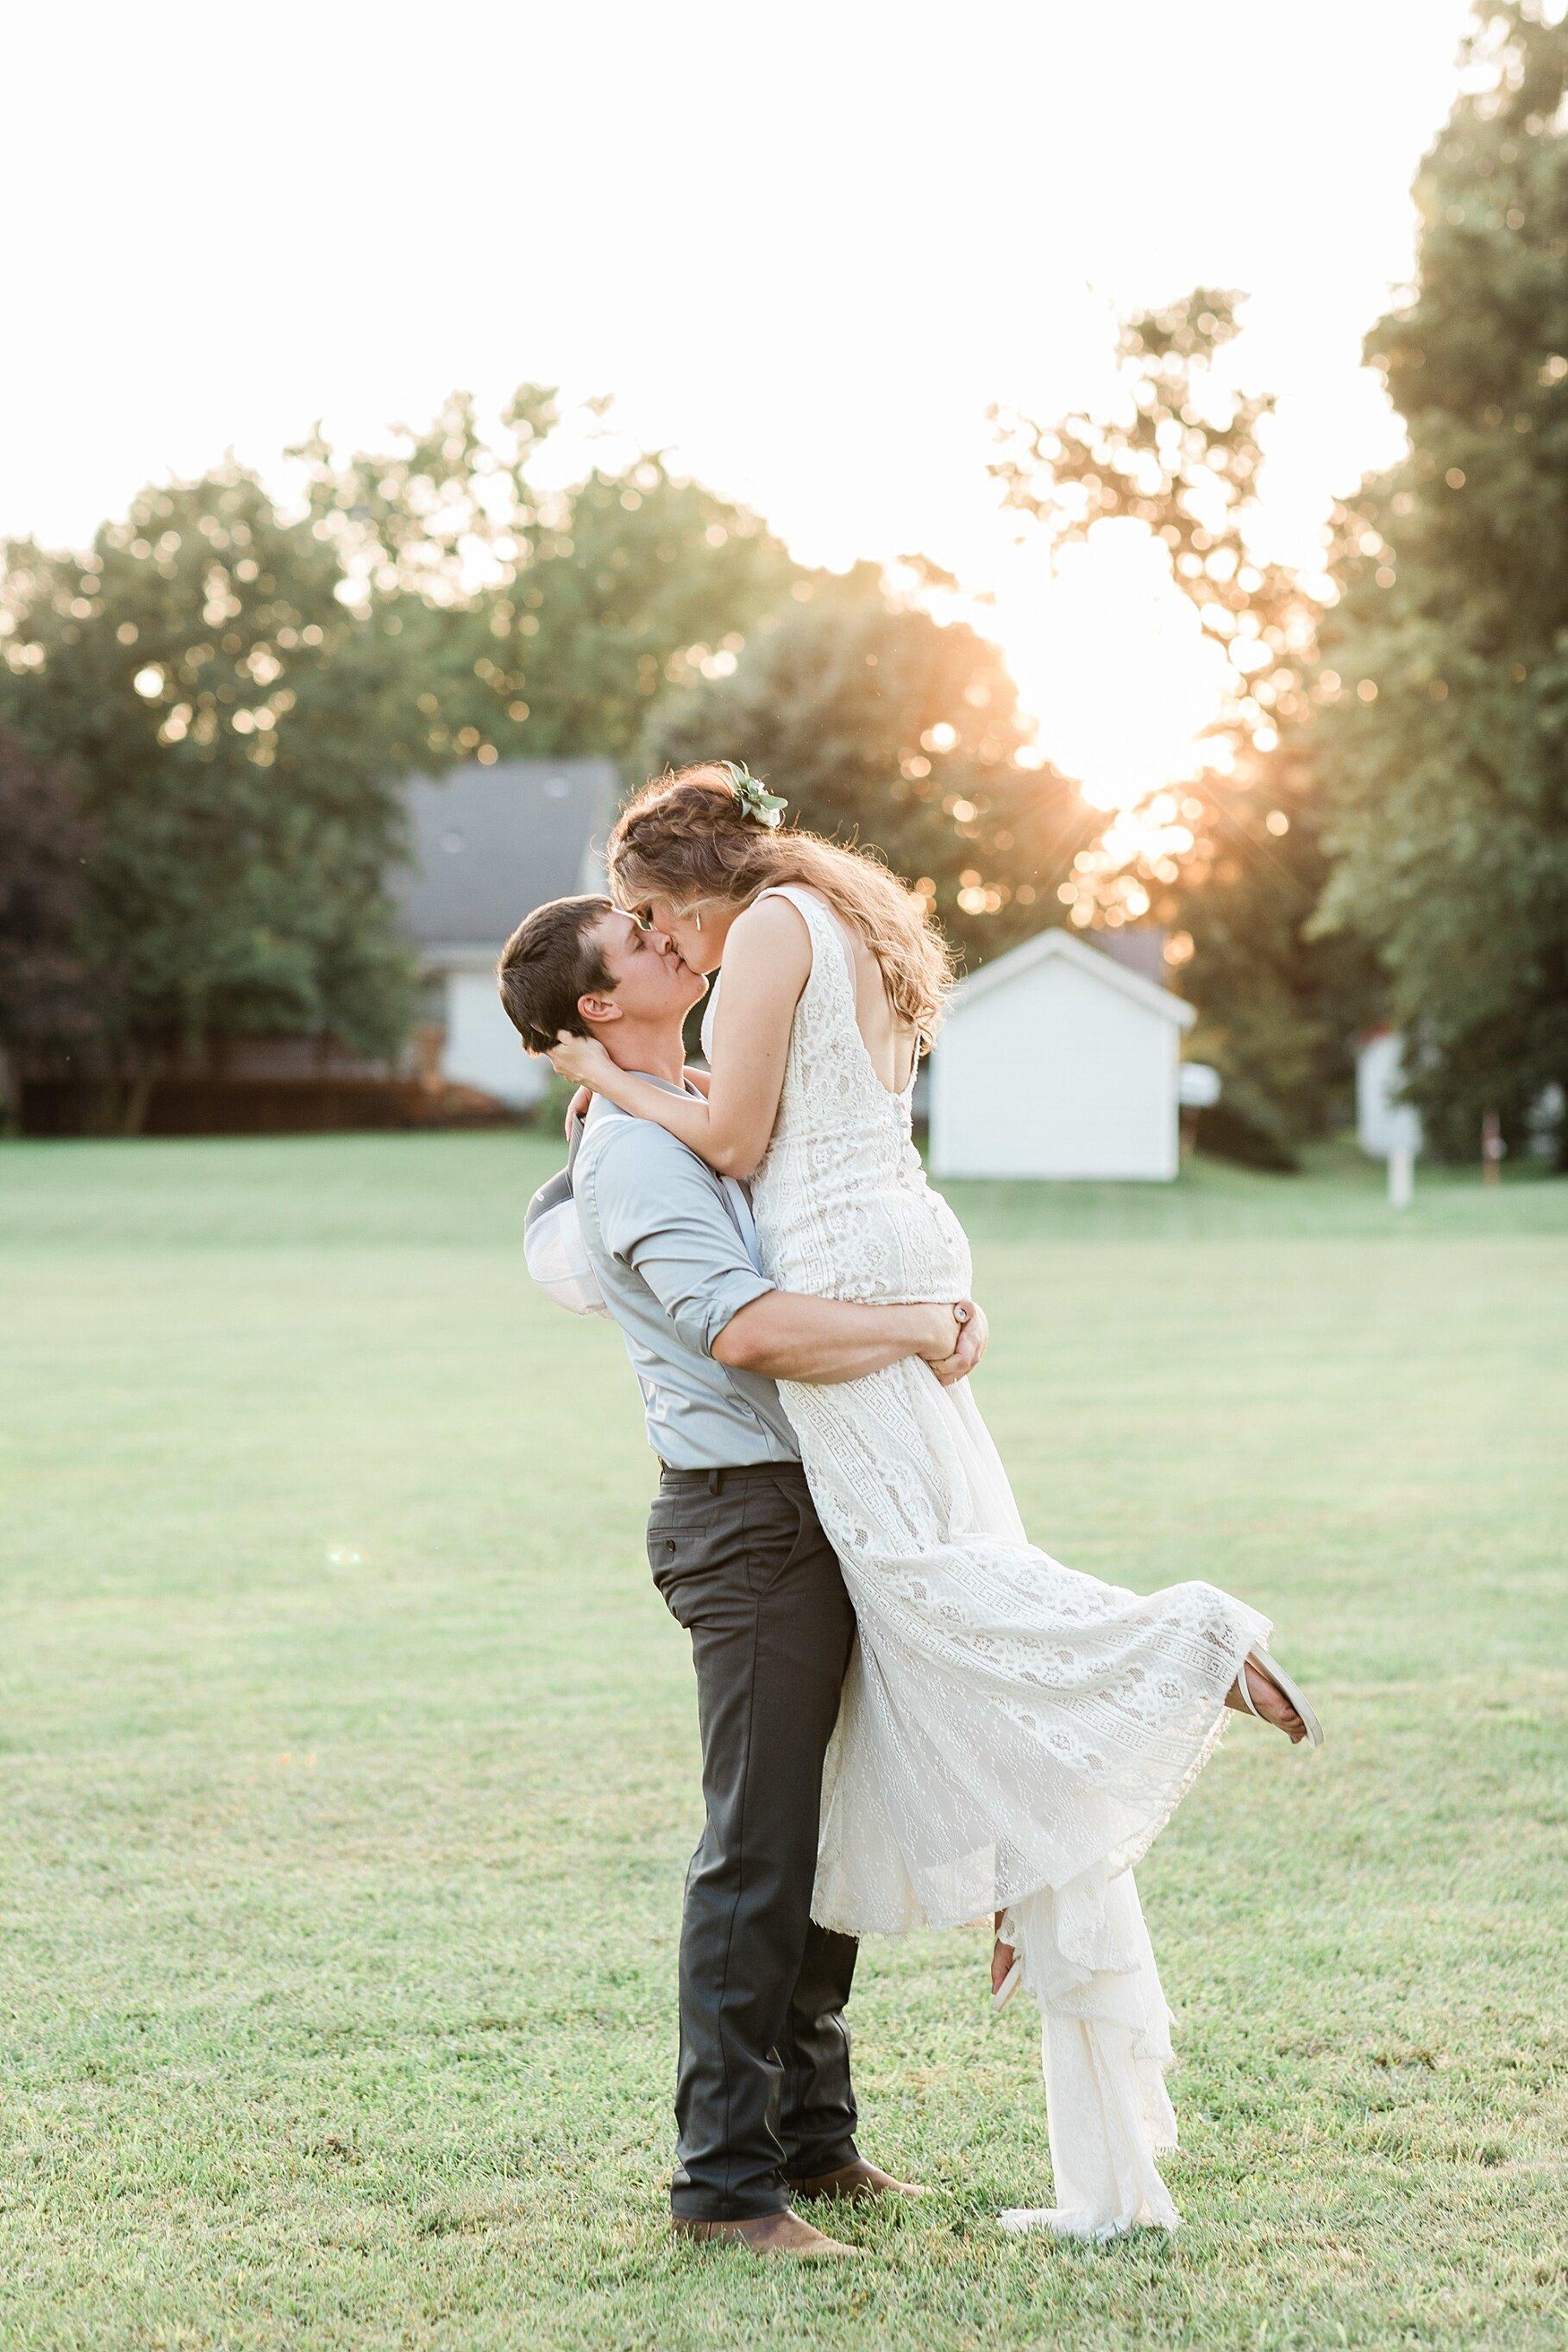 Earth-Toned Wedding by KKP Associate Wedding Photographer and Kelsi Kliethermes Photography Best Columbia Missouri Wedding Photographer_0040.jpg